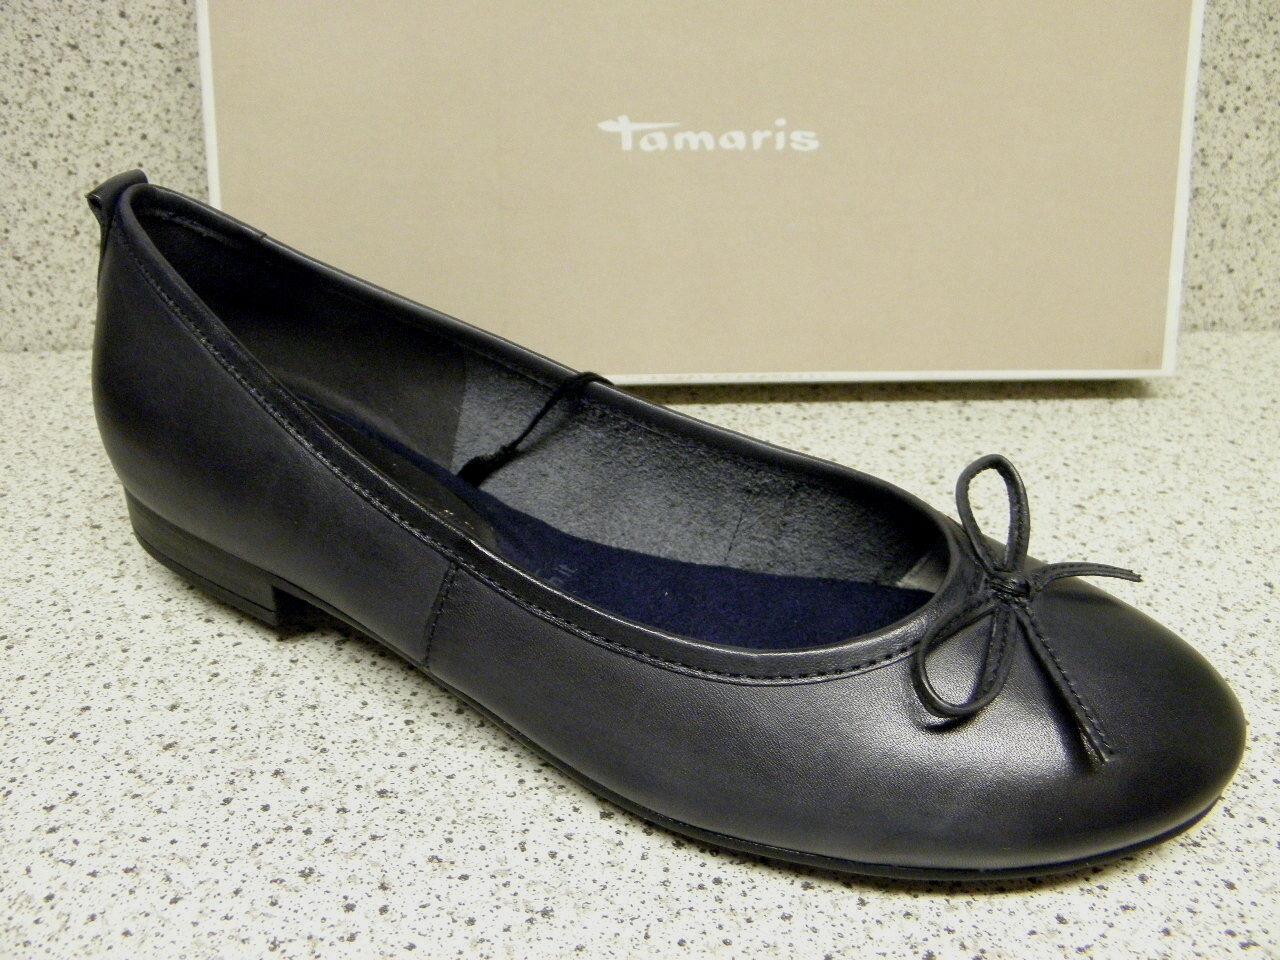 Tamaris ® riduce sale Ballerina in pelle blu (ta41)